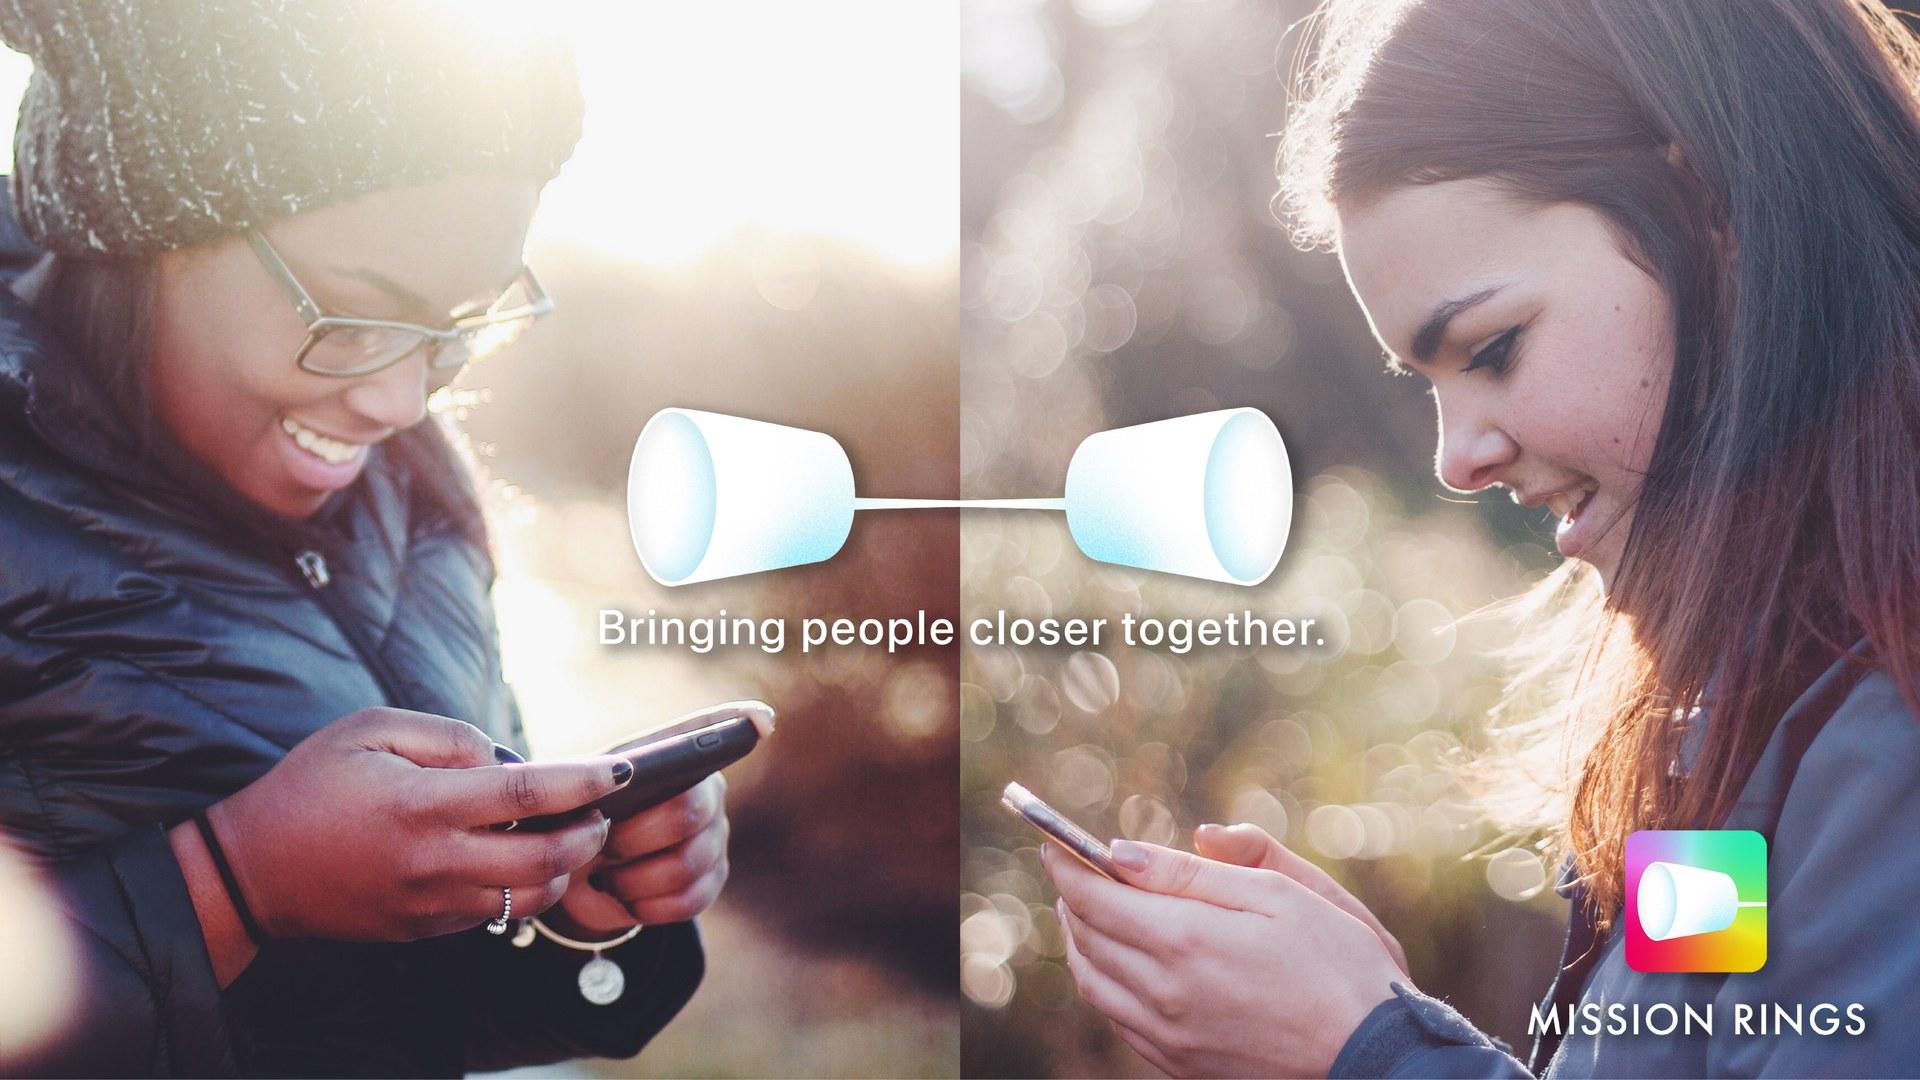 Mission Rings: Bringing People Closer Together